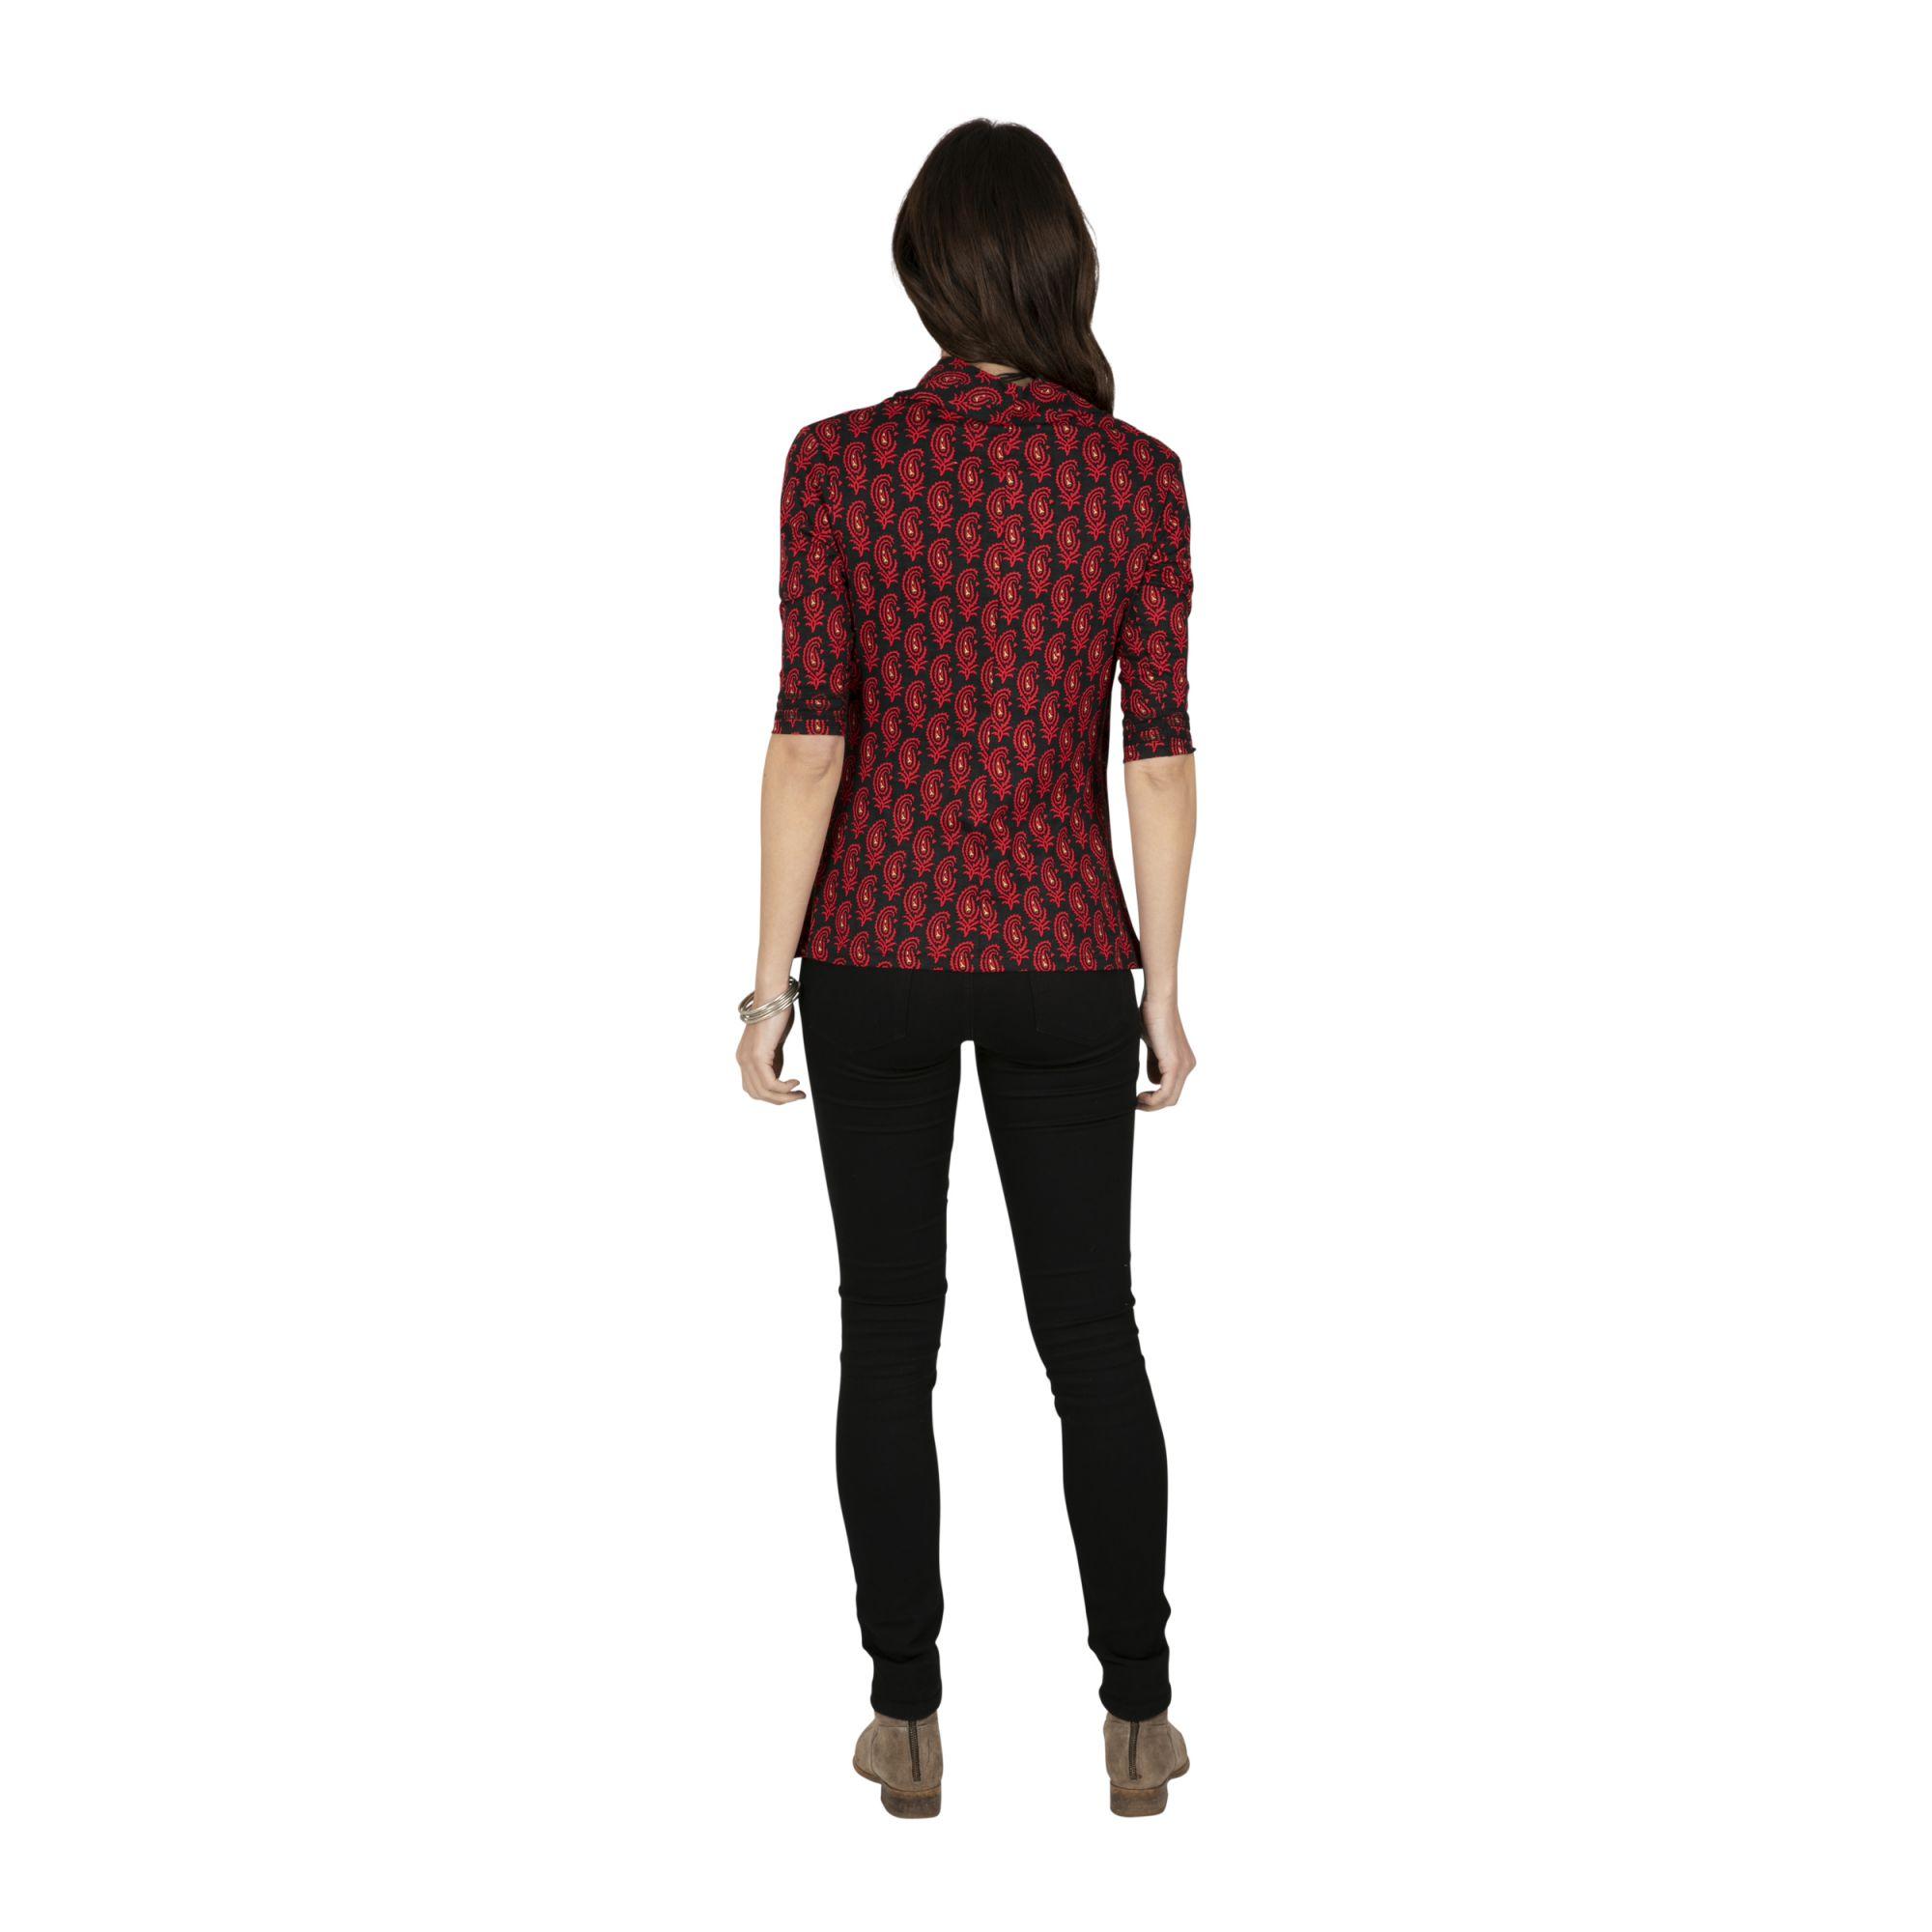 Tee-shirt coton bohème à manches 3/4 femme Lugazi